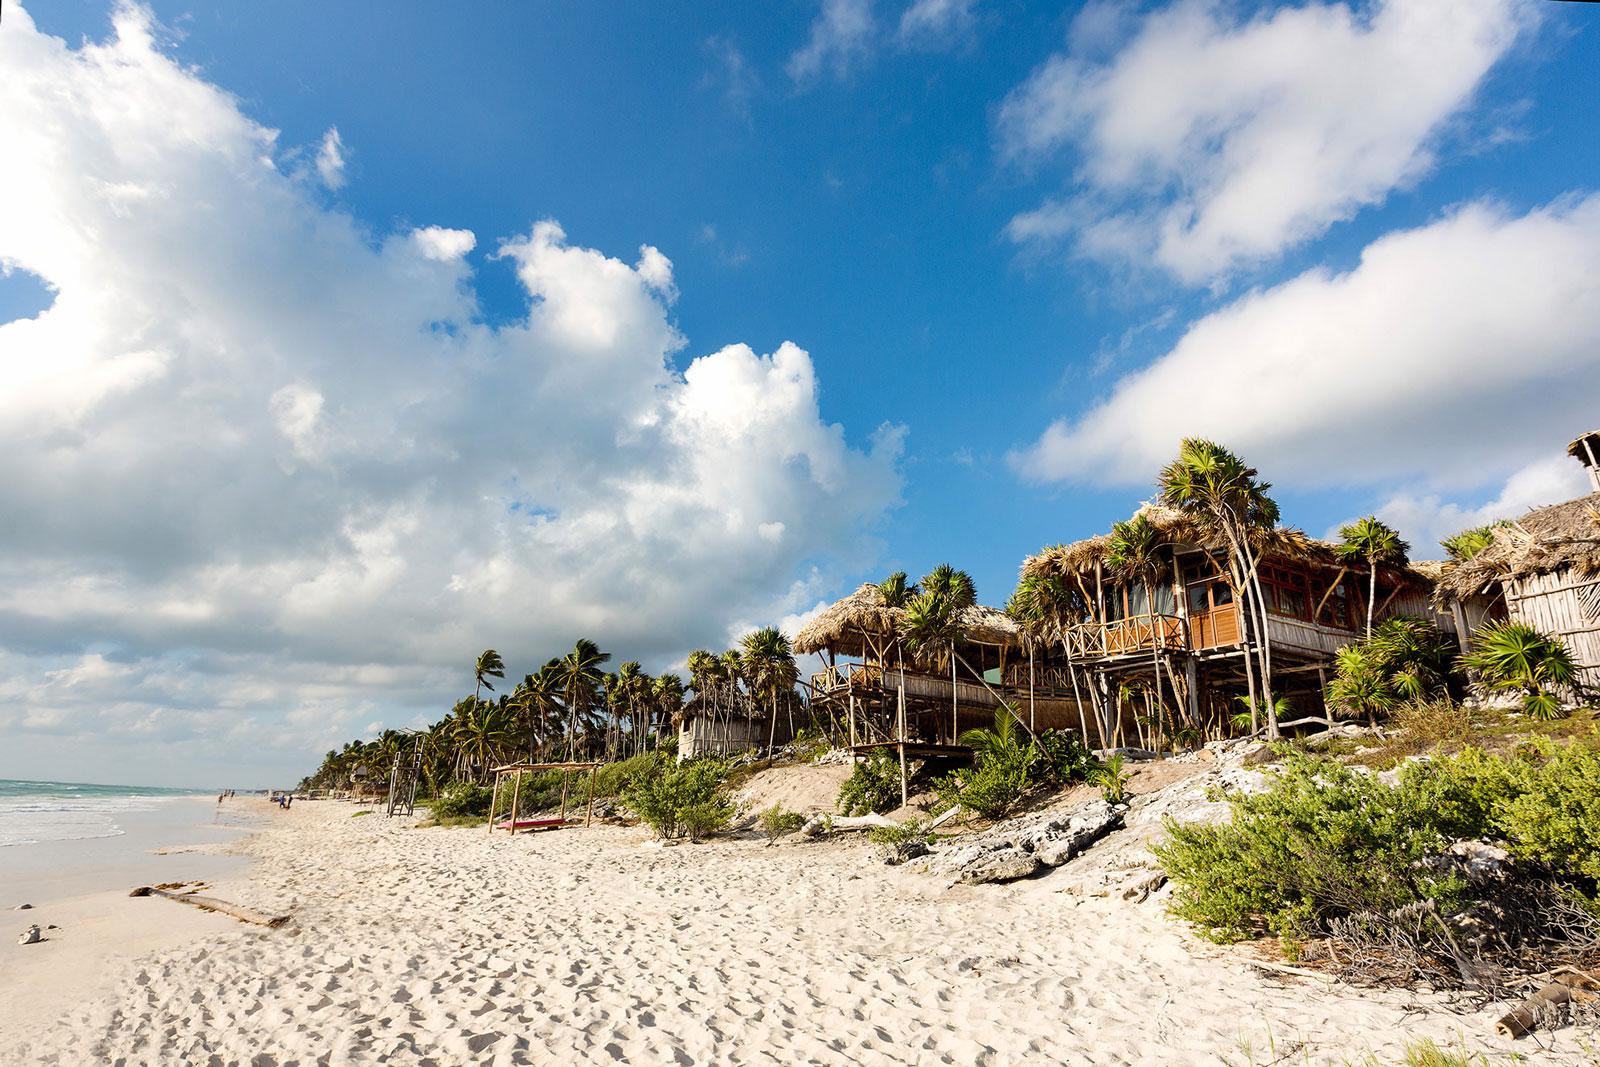 Maya_Luxe_Riviera_Maya_Luxury_Villas_Experiences_Tulum_Hotel_Zone_2_Bedrooms_Casa_Madera_4 (1).jpg